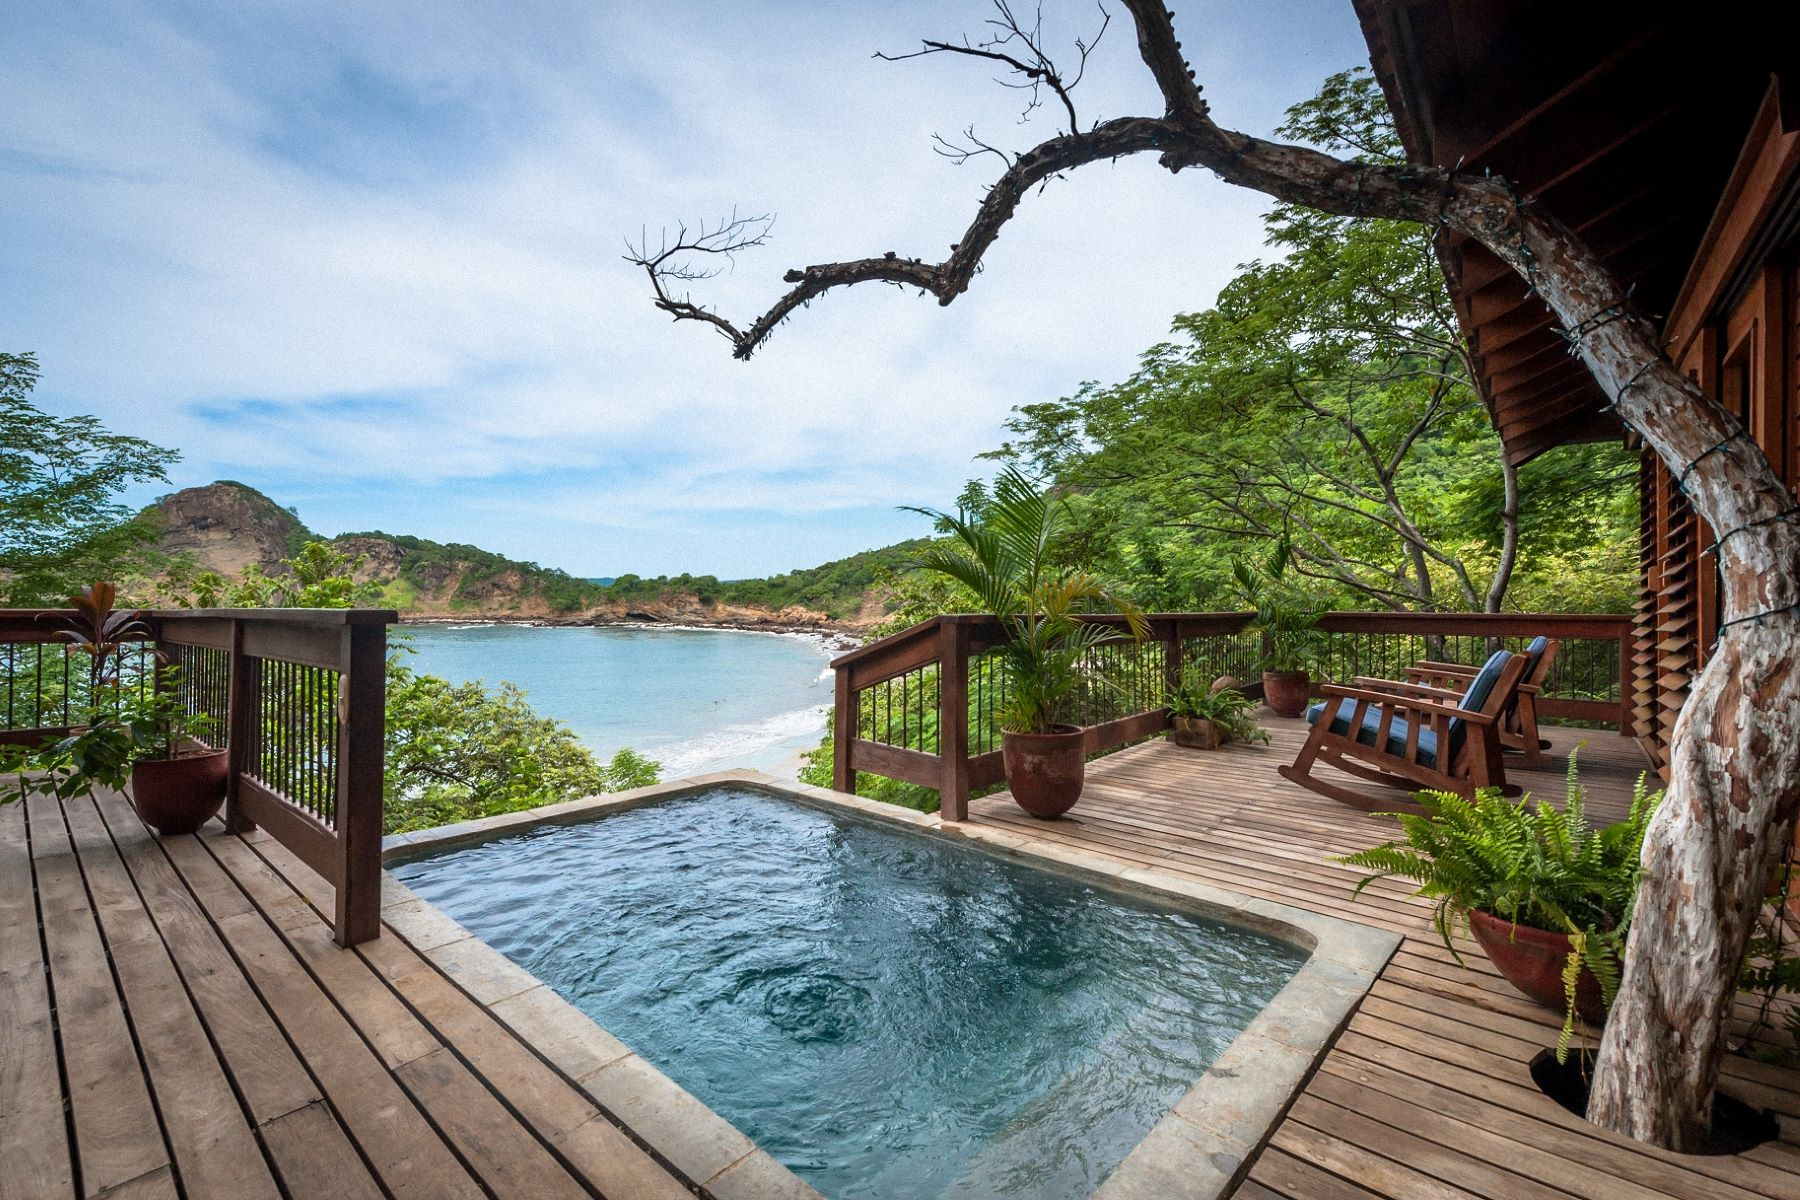 شقة بعمارة للـ Sale في Luxury Treehouse Overlooking Pristine Beach Other Rivas, Rivas, Nicaragua